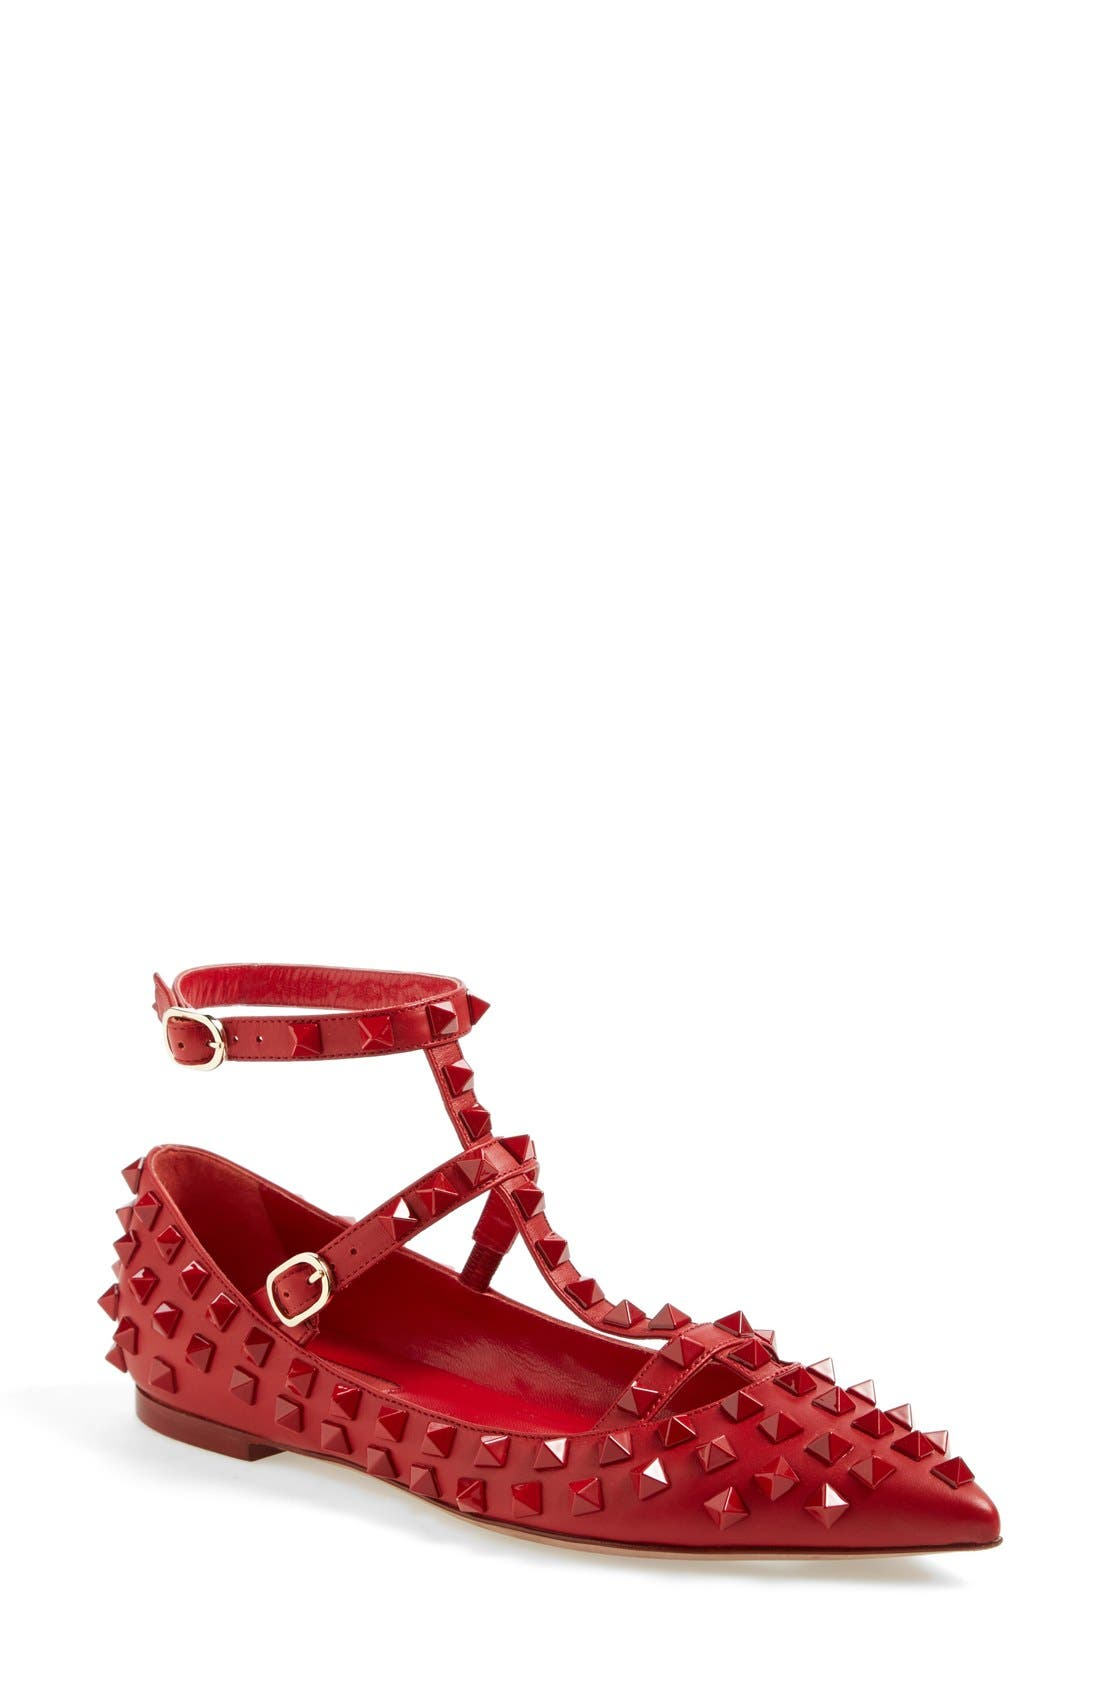 VALENTINO GARAVANI 'Rockstud' T-Strap Pointy Toe Flat, Main, color, 600